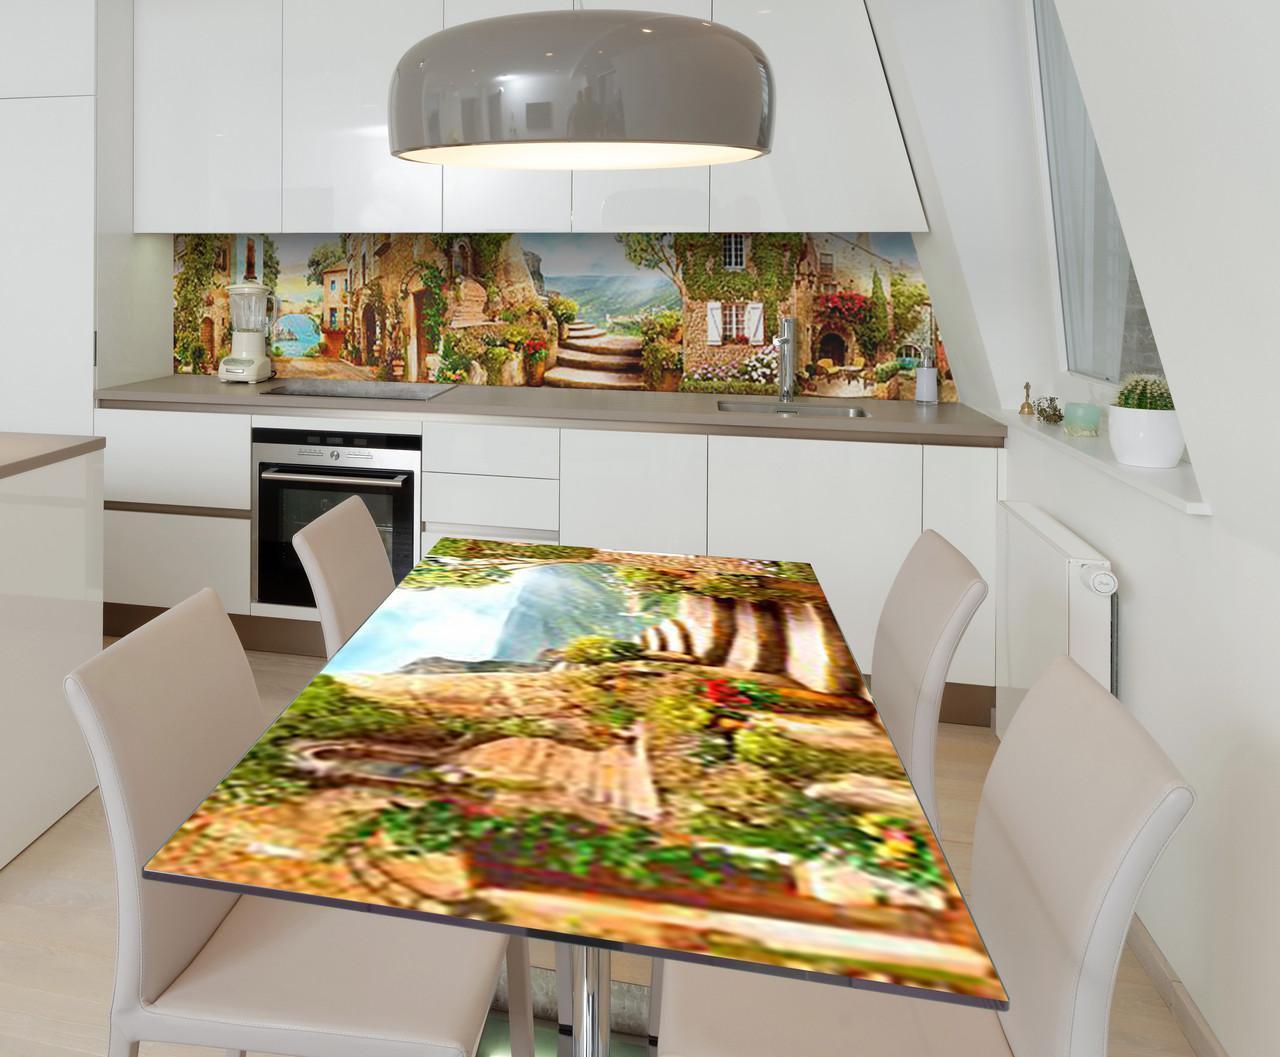 Наклейка 3Д виниловая на стол Zatarga «Английский дворик» 600х1200 мм для домов, квартир, столов, кофейн, кафе